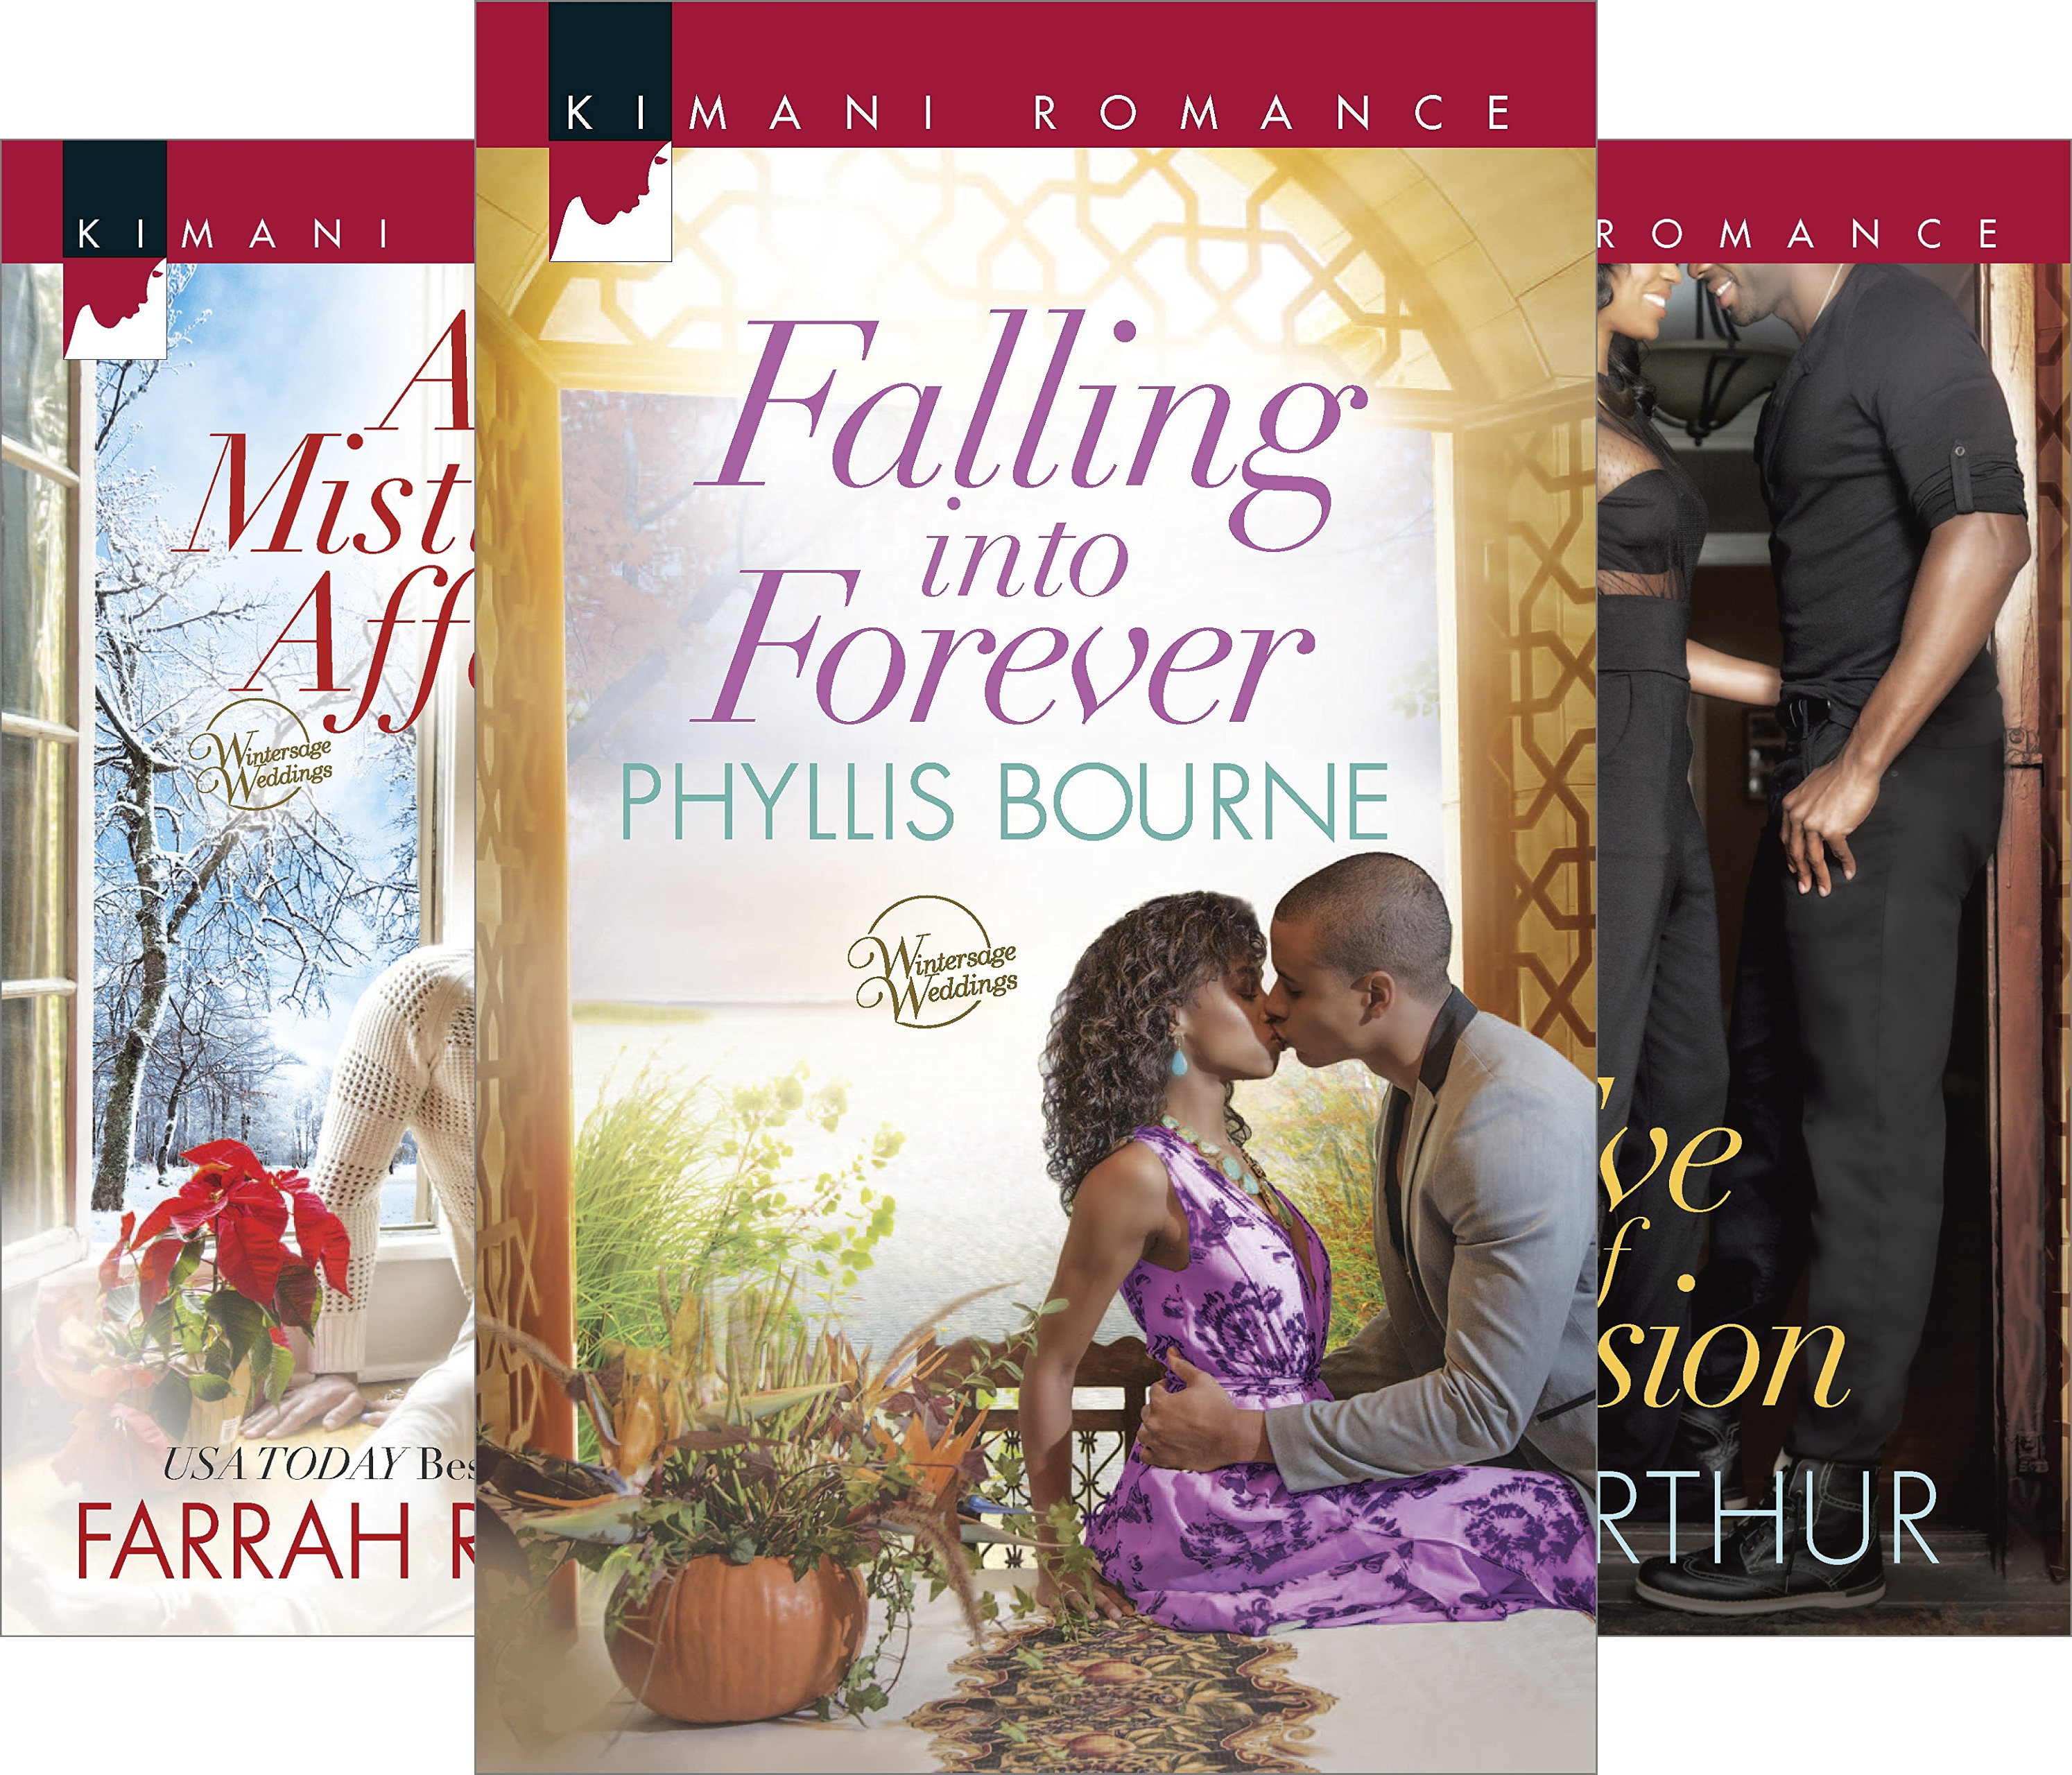 Wintersage Weddings (3 Book Series) (Kindle Phyllis Bourne Edition)